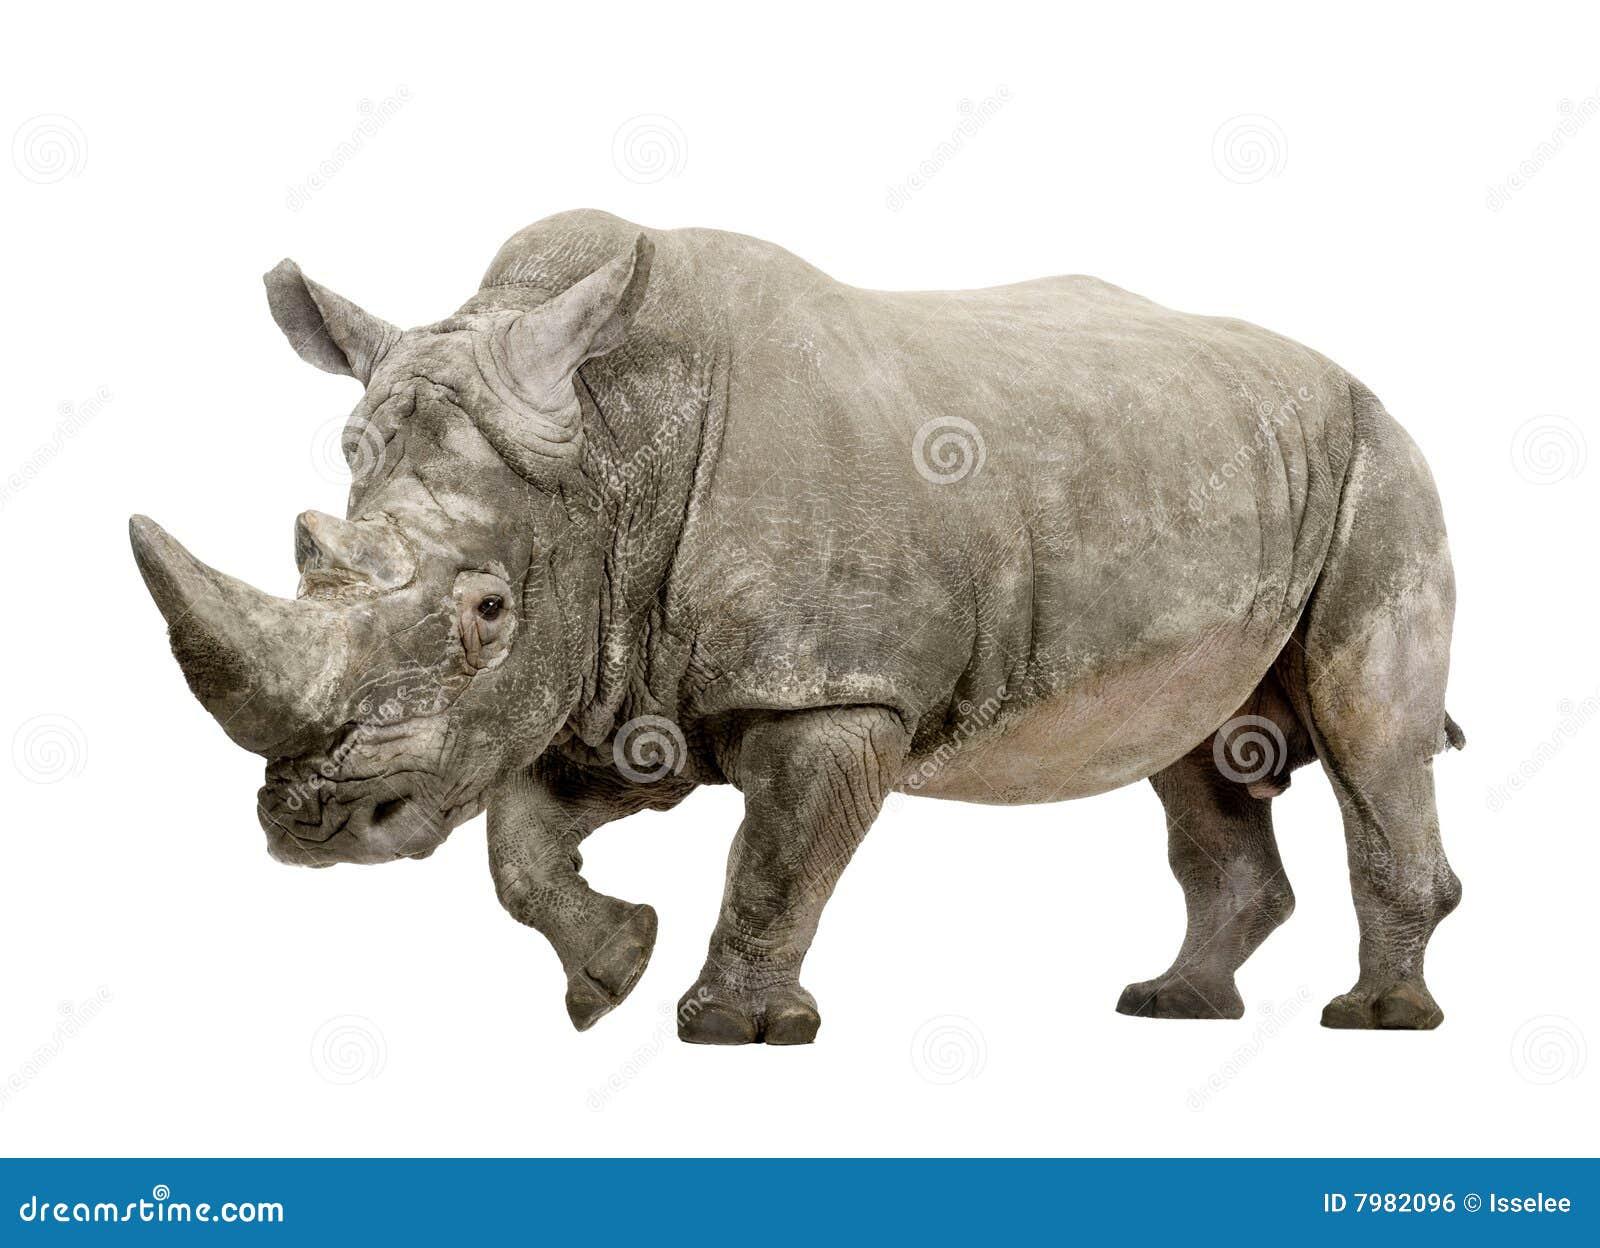 Rinoceronte blanco - simum del Ceratotherium (+/- 10 años)